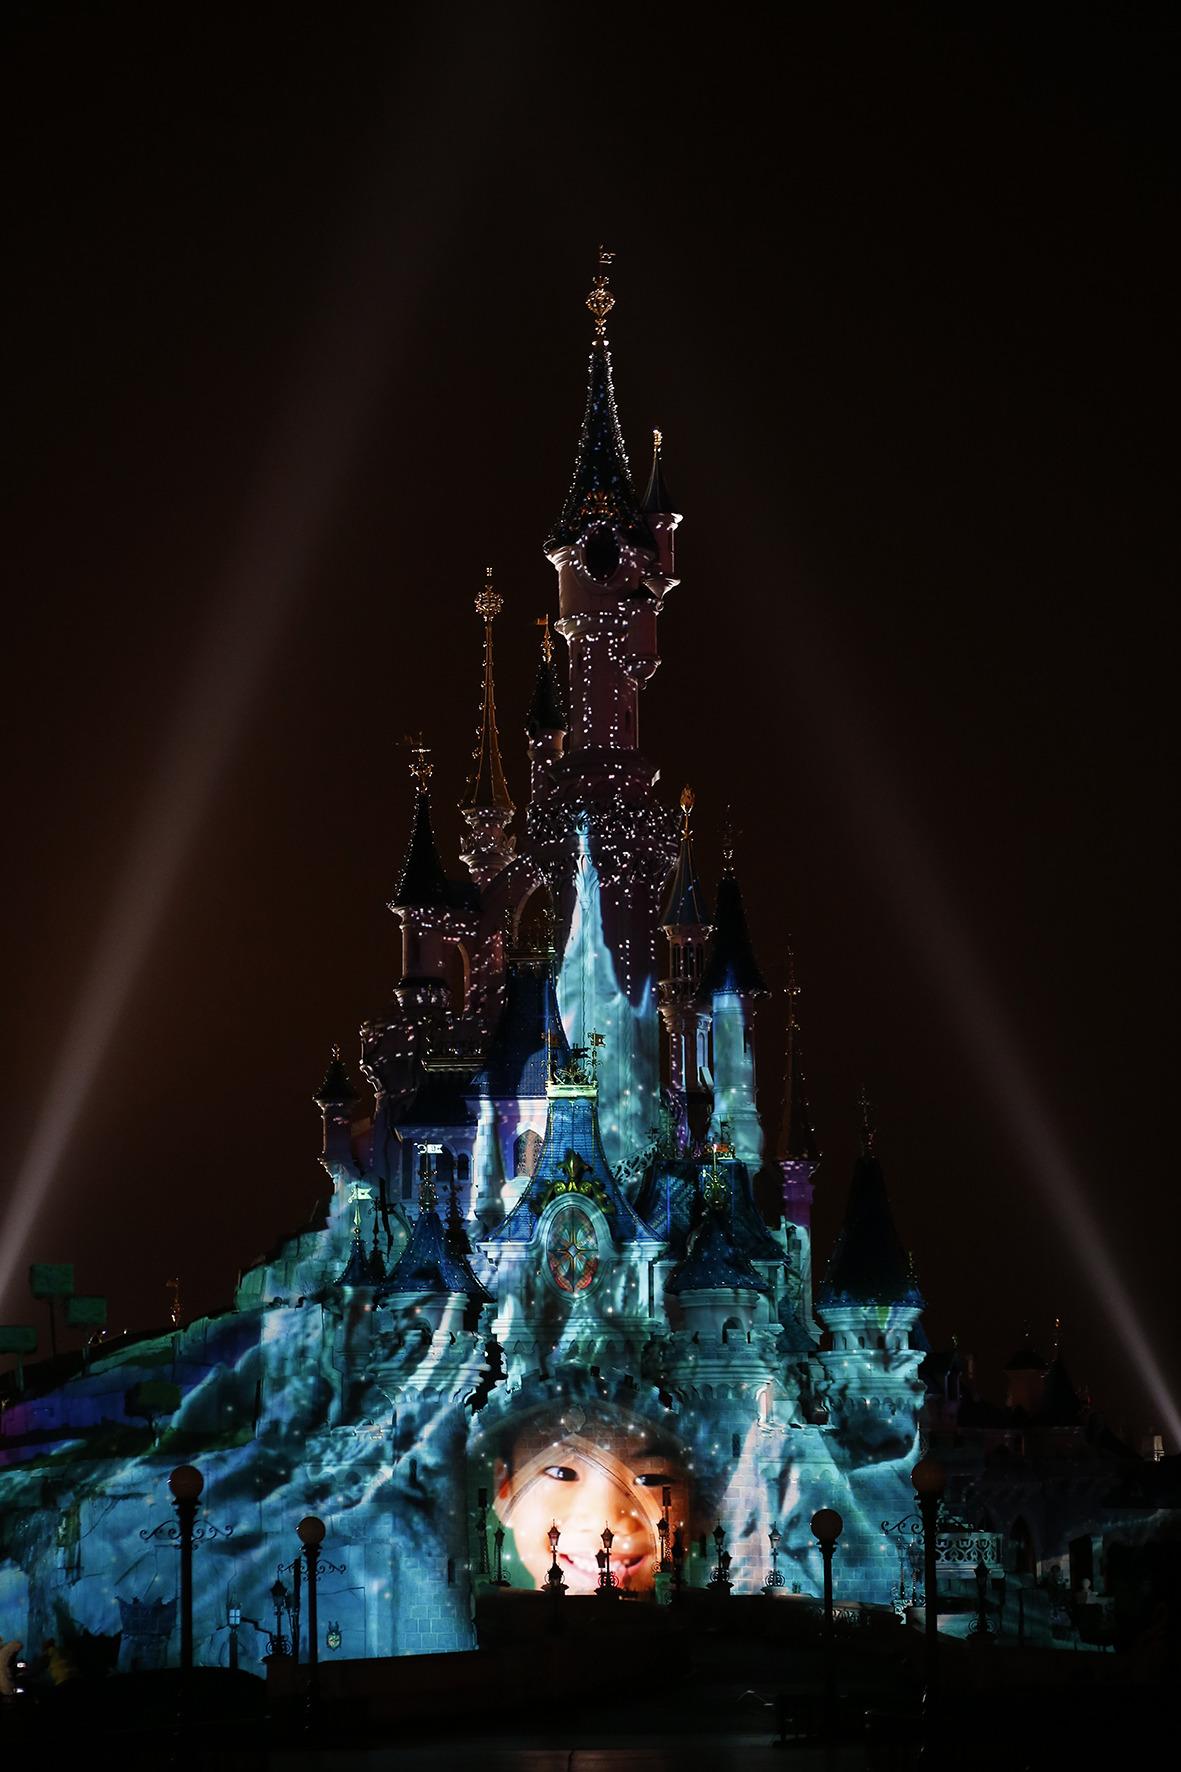 2019 - Disneynature Dn00710